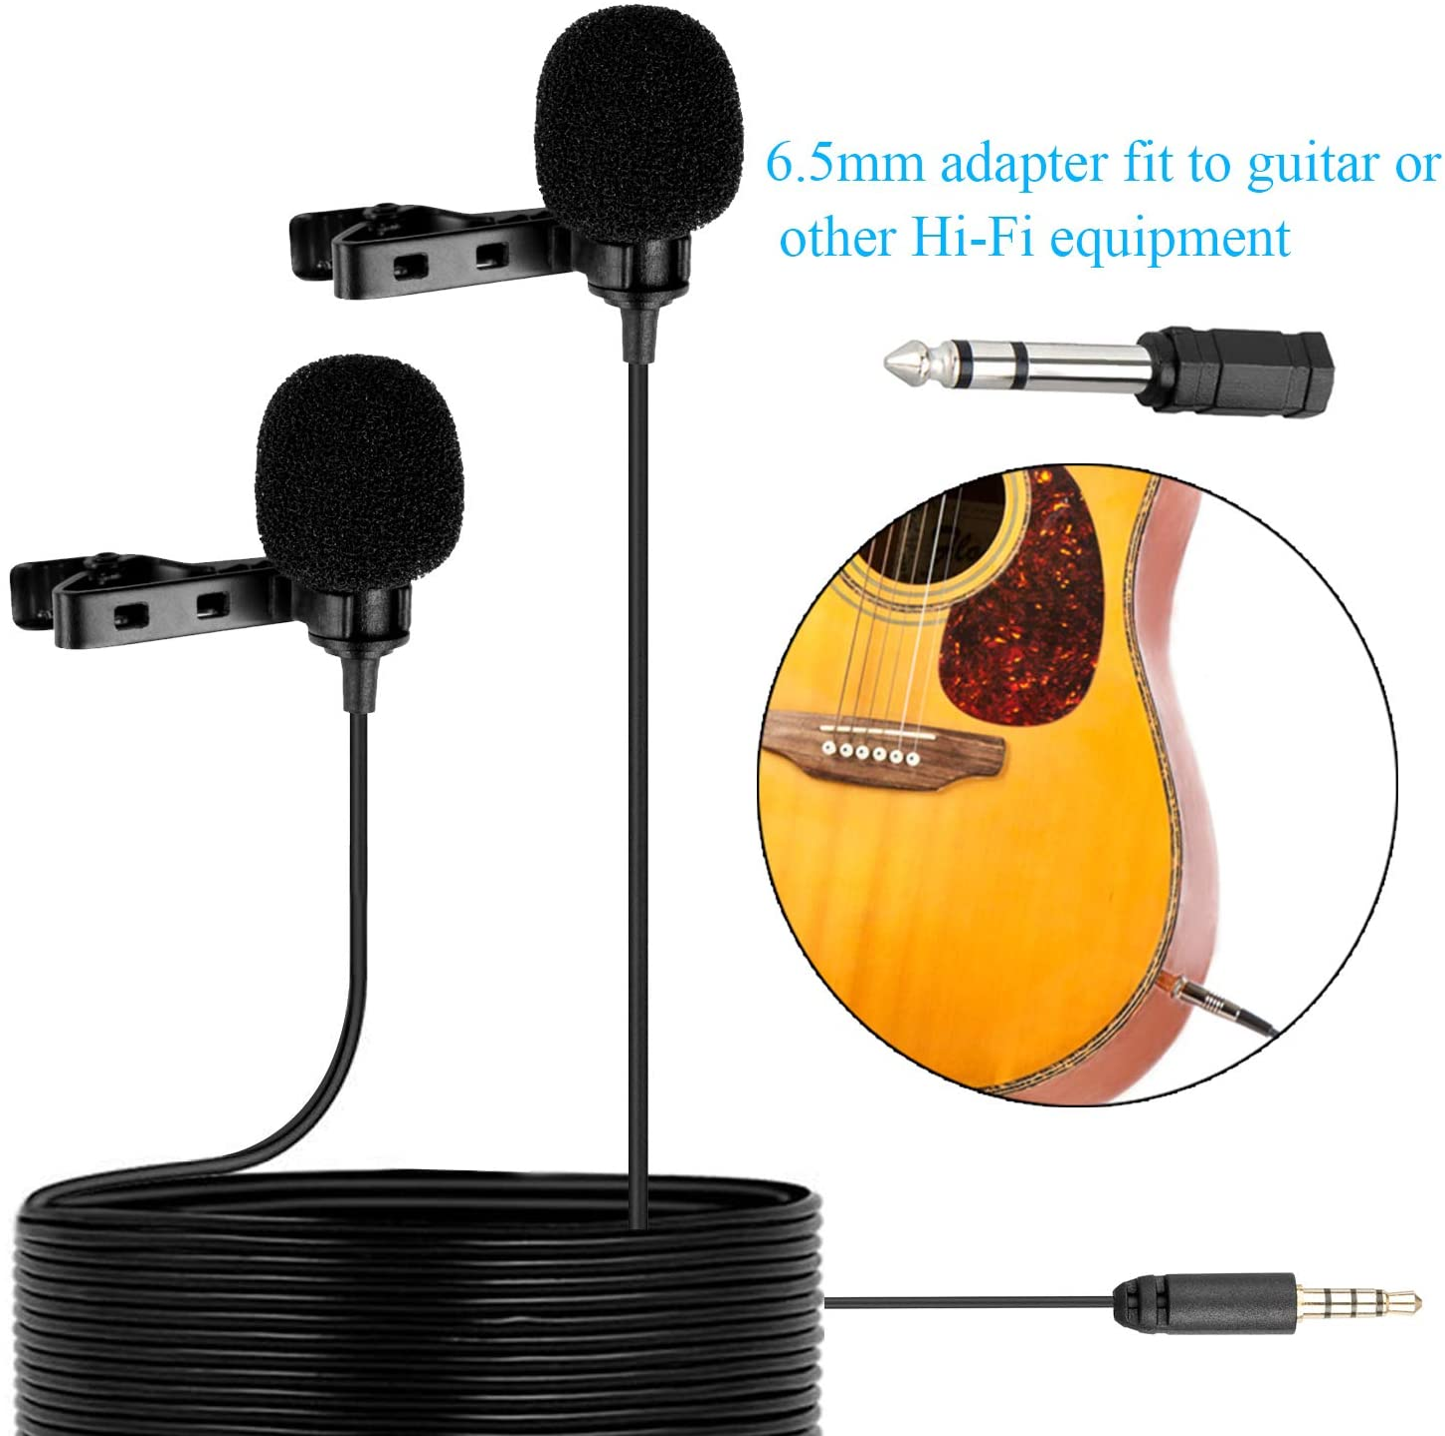 omnidirektionales Kondensatormikrofon f/ür iOS iPhone Android Handy DSLR Kamera Gitarre Aufnahme YouTube Interview Podcast Blog Vlog BOYA BY-M1DM Dual-Lavalier-Mikrofon